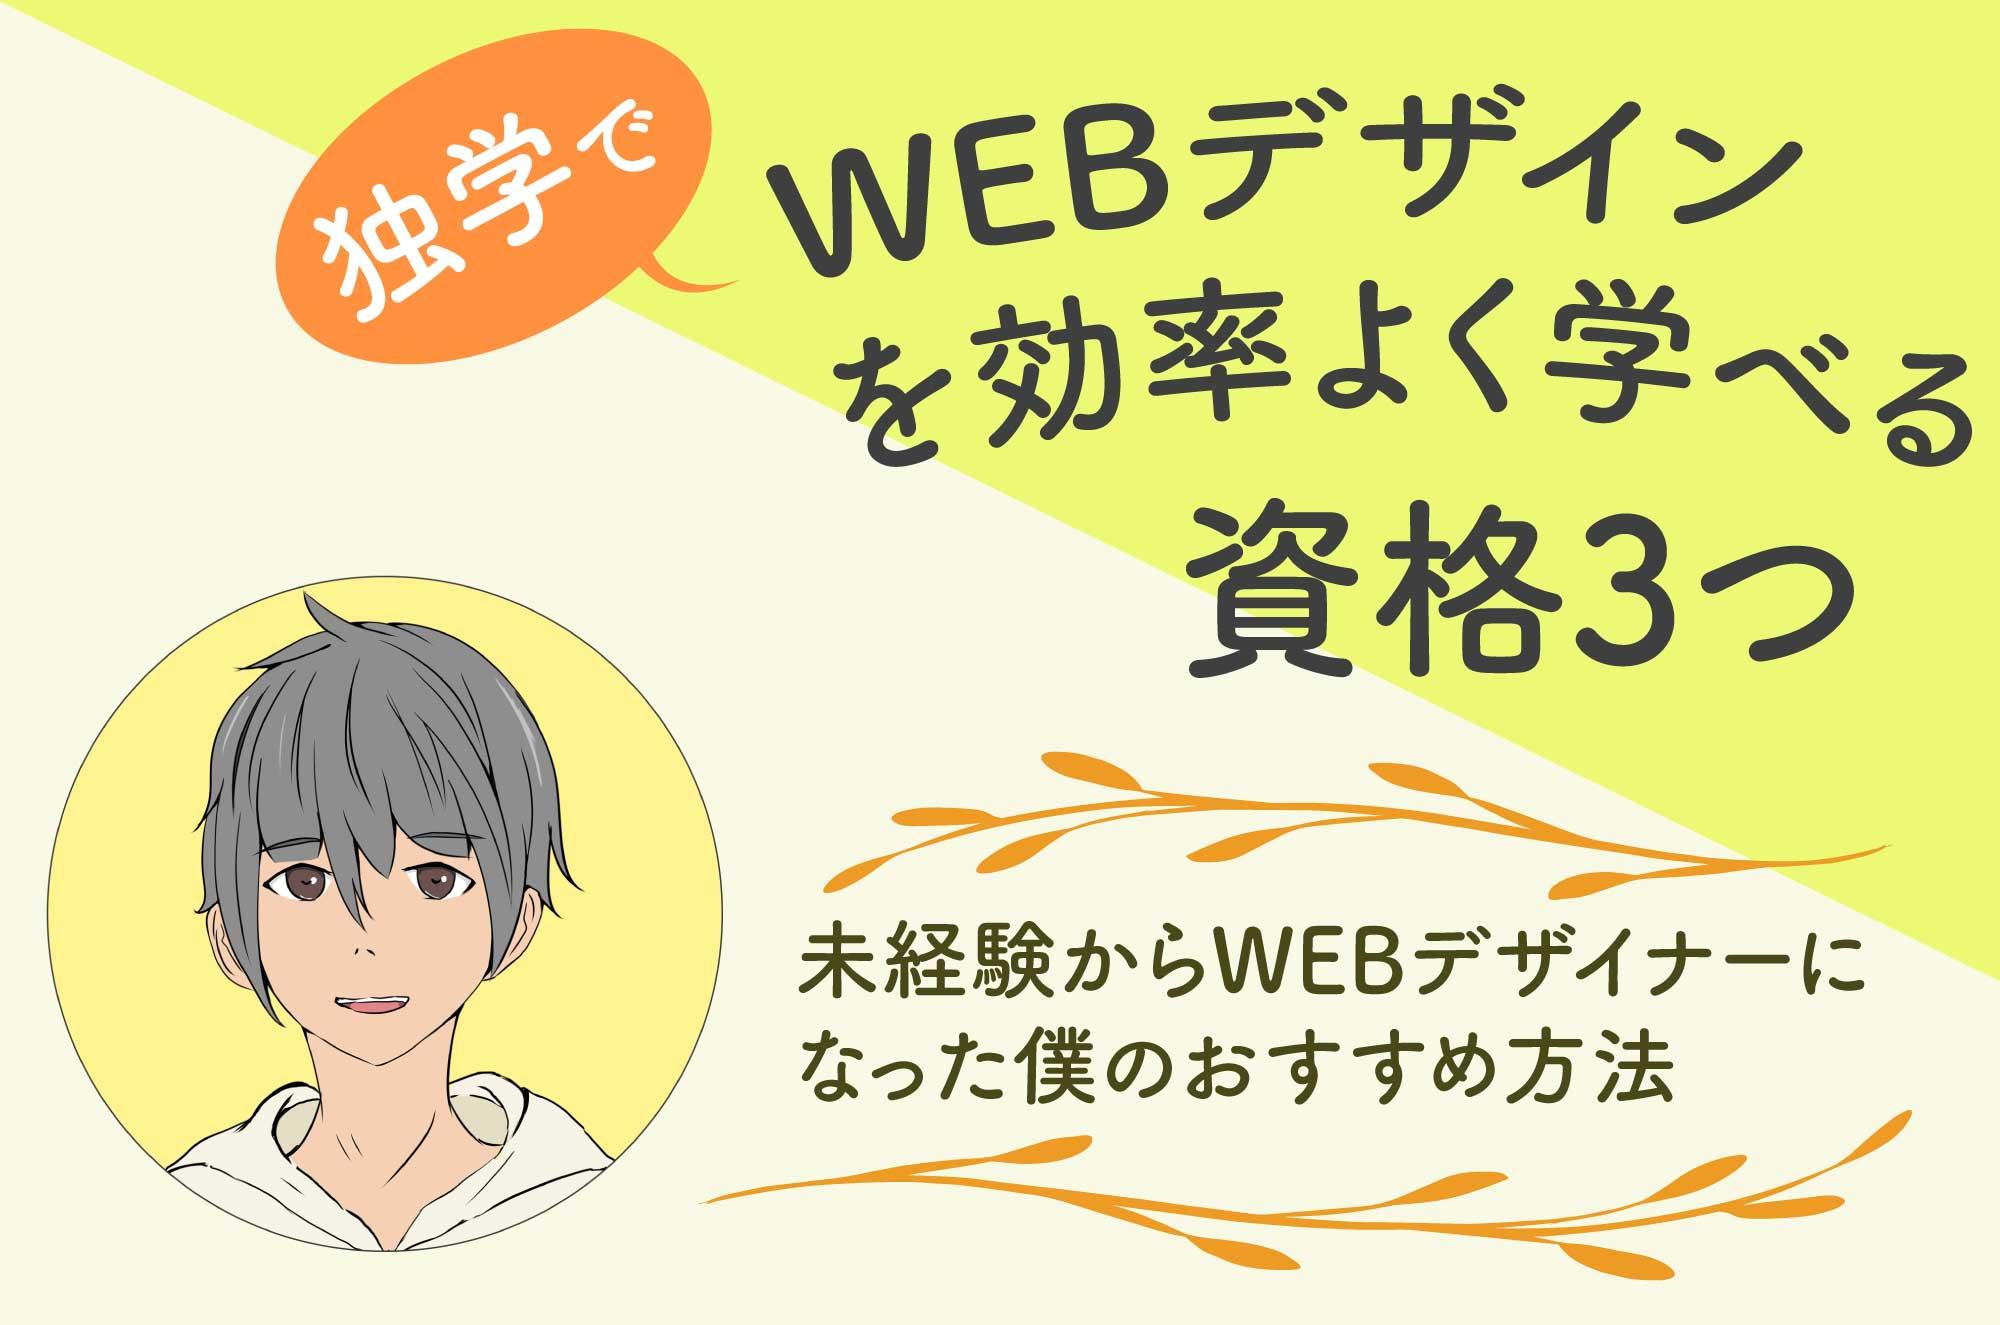 WEBデザインを独学で学べる未経験者におすすめな資格3つ